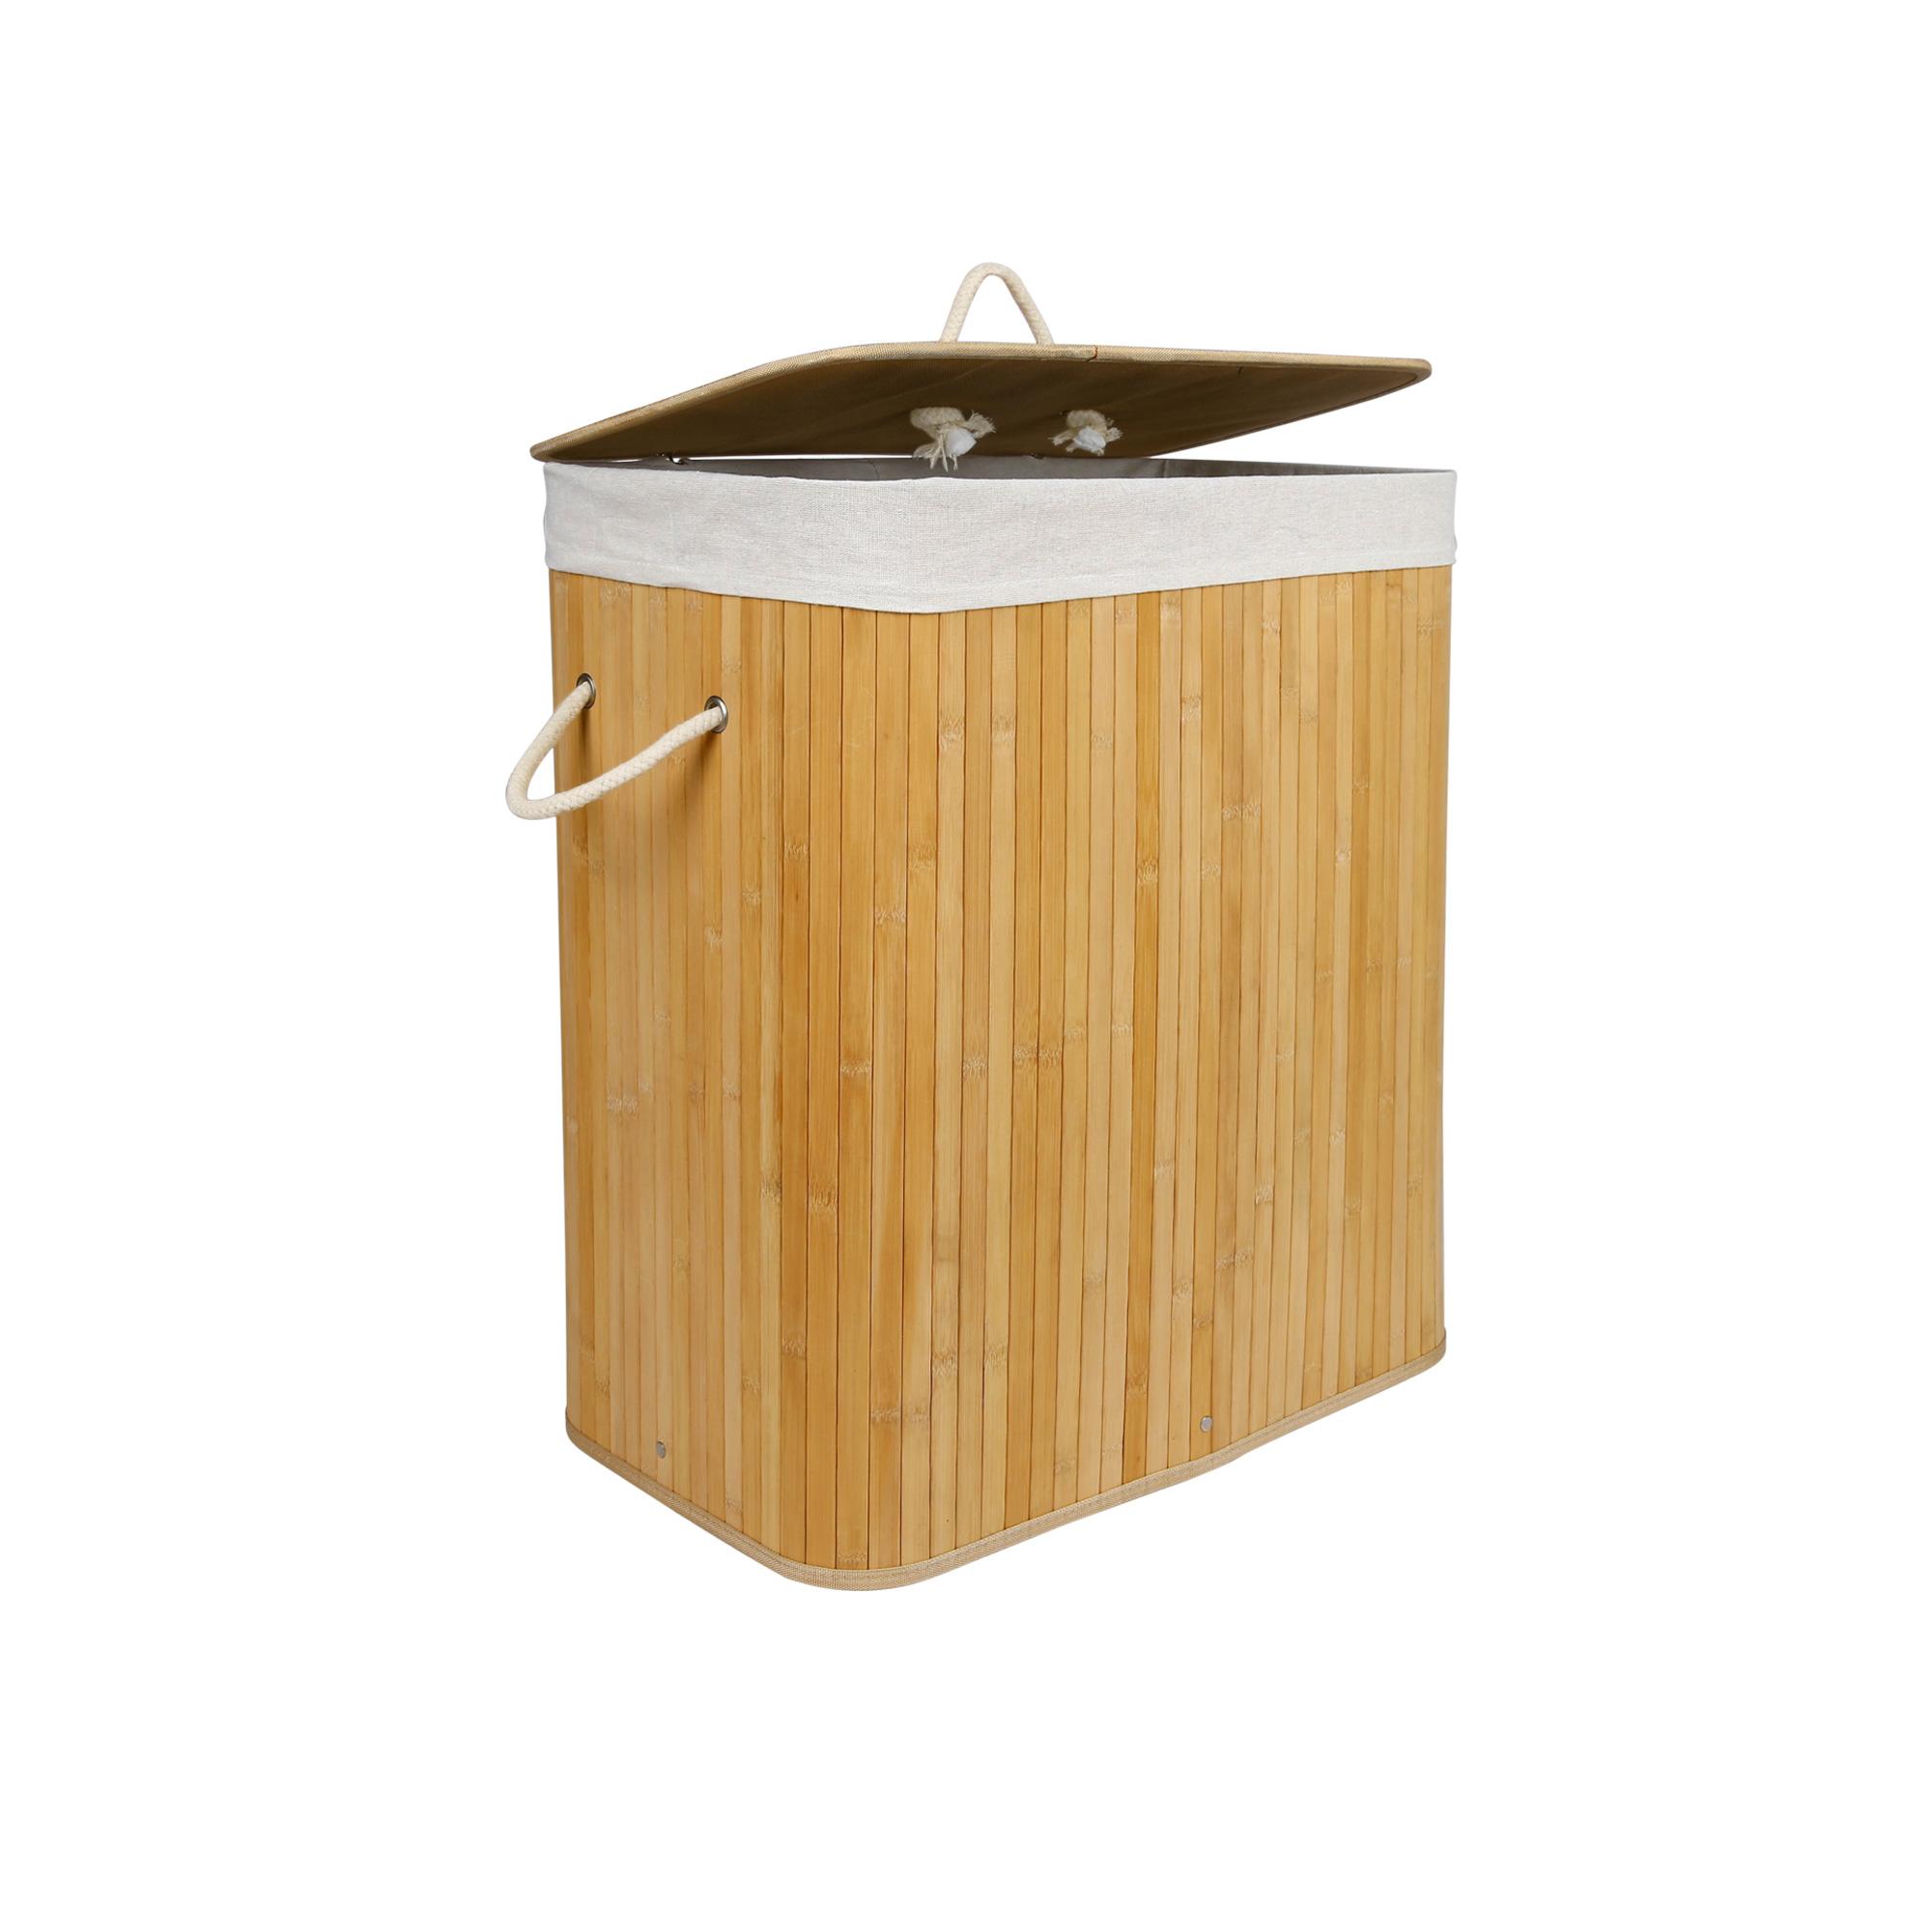 panier linge corbeille en bambou pliable bac linge sac. Black Bedroom Furniture Sets. Home Design Ideas